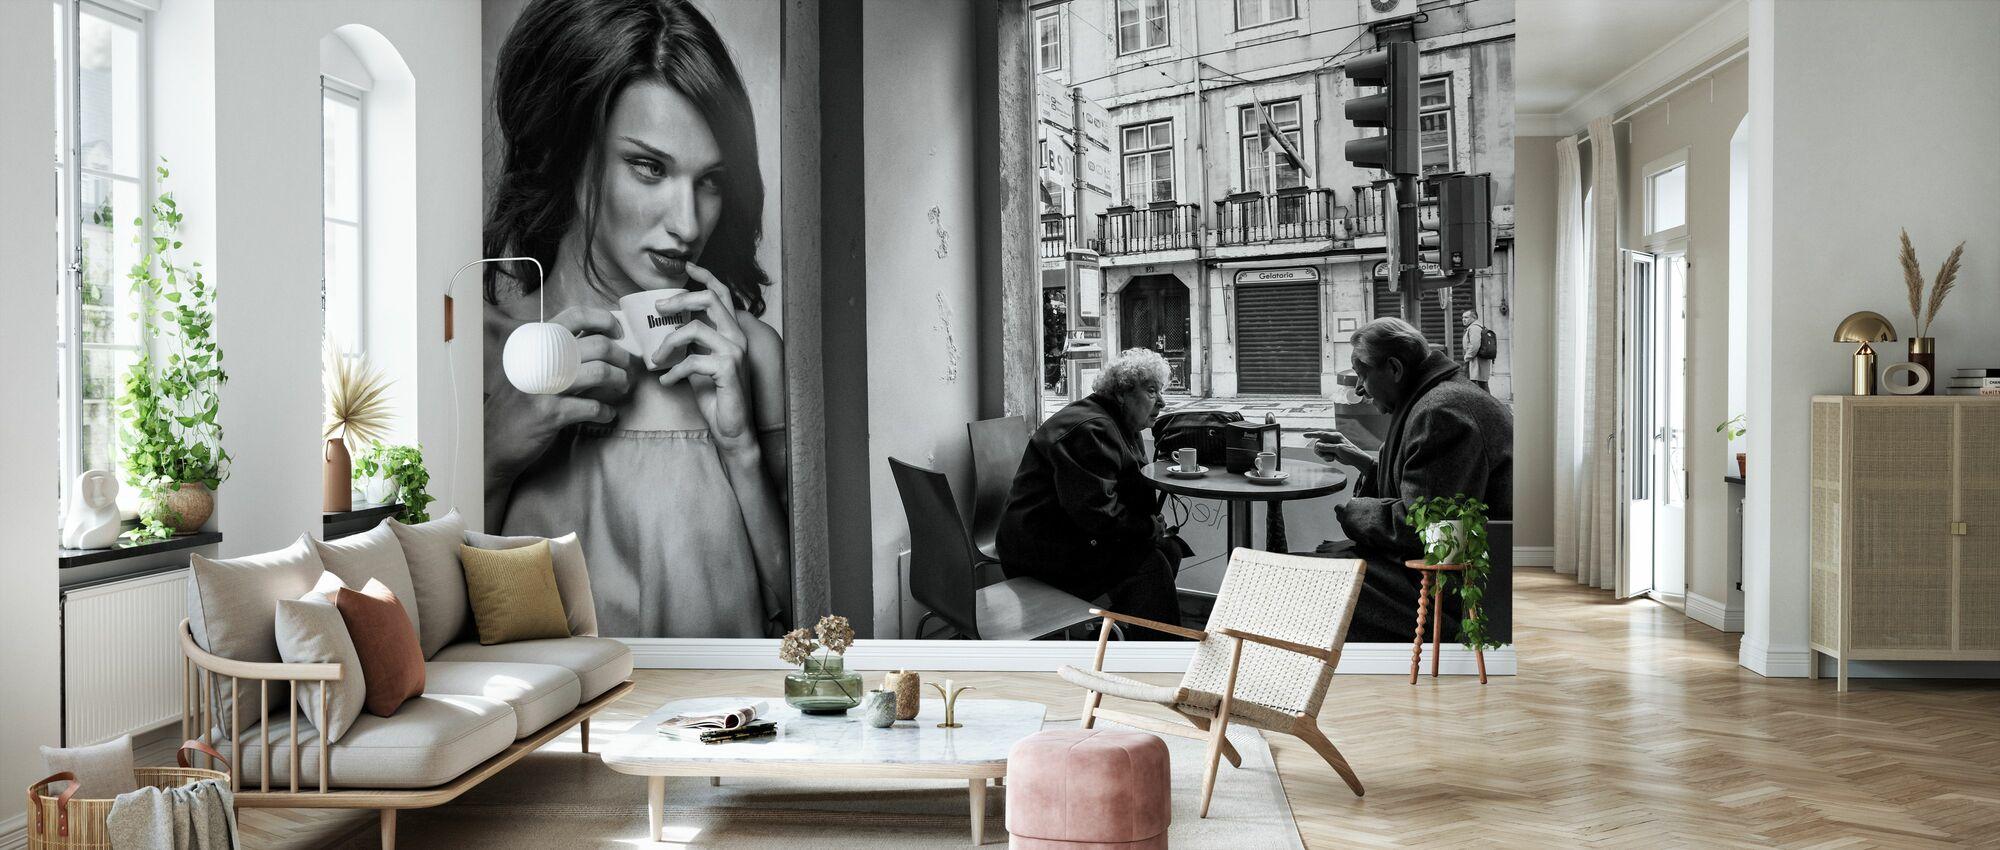 Coffee Conversations - Wallpaper - Living Room